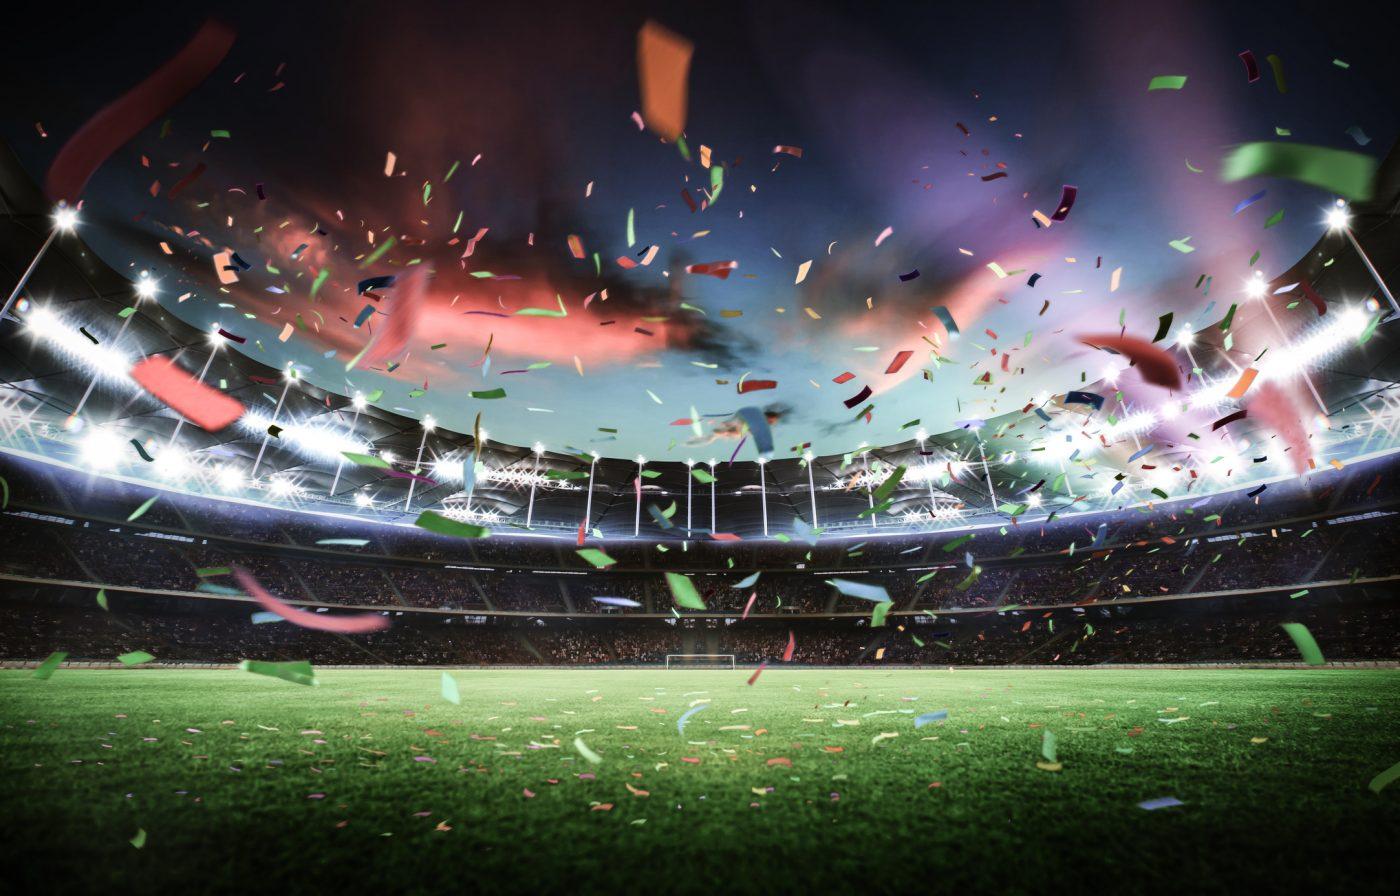 【esports】日本の文化として育つ可能性に期待、地域と連携し盛り上げる 株式会社サードウェーブ取締役副社長 PC・eスポーツ事業担当 榎本一郎氏